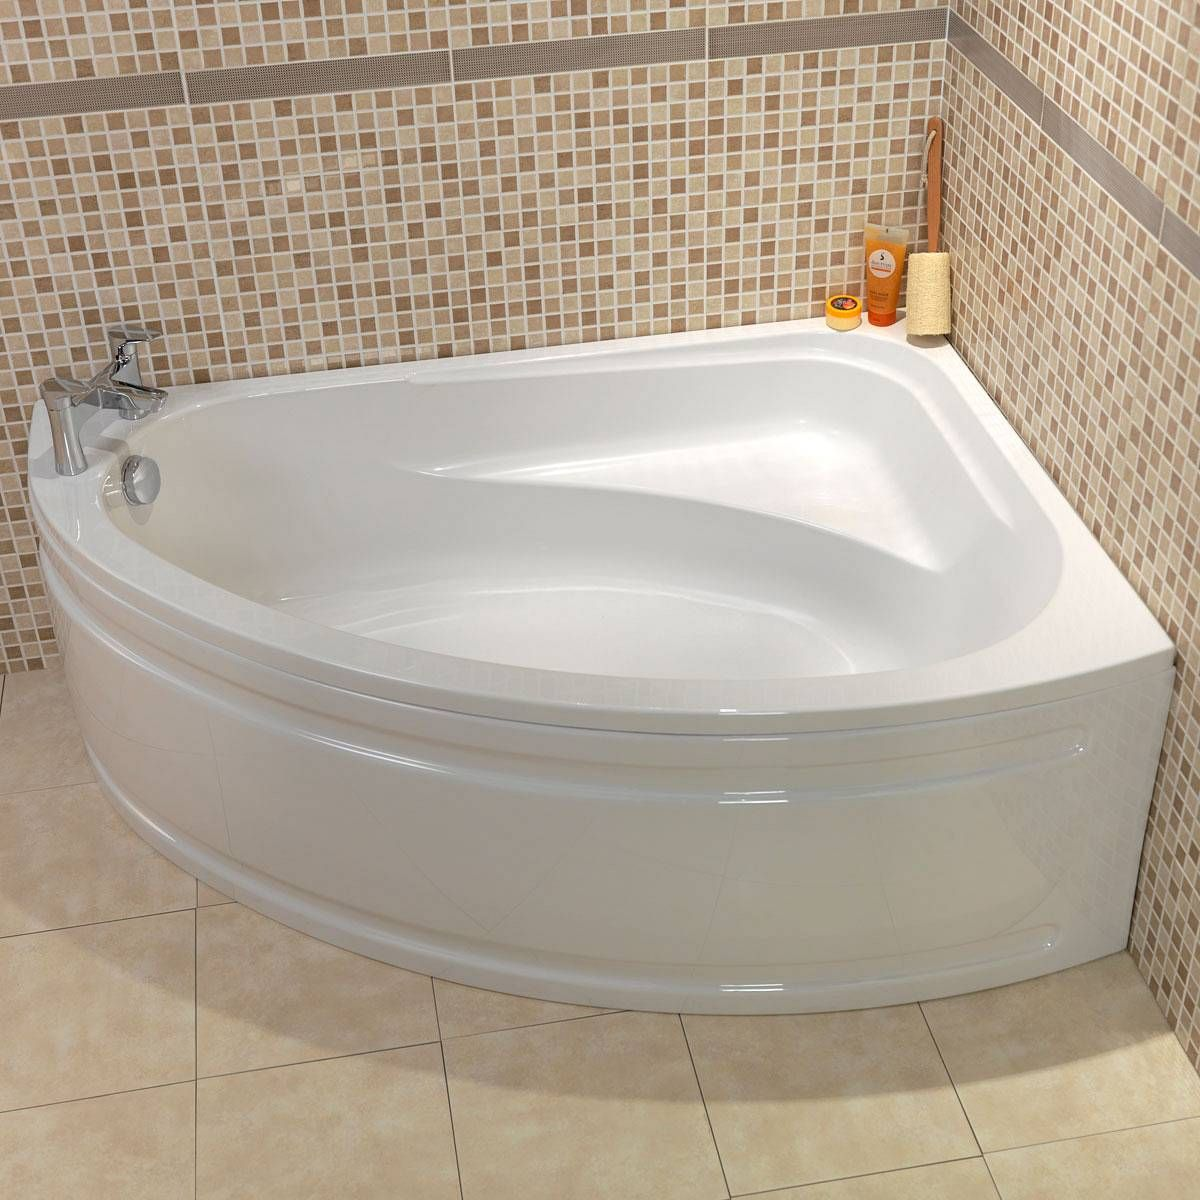 Orchard elsdon right handed corner bath in 2019 - Bathtub shower combo for small bathroom ...